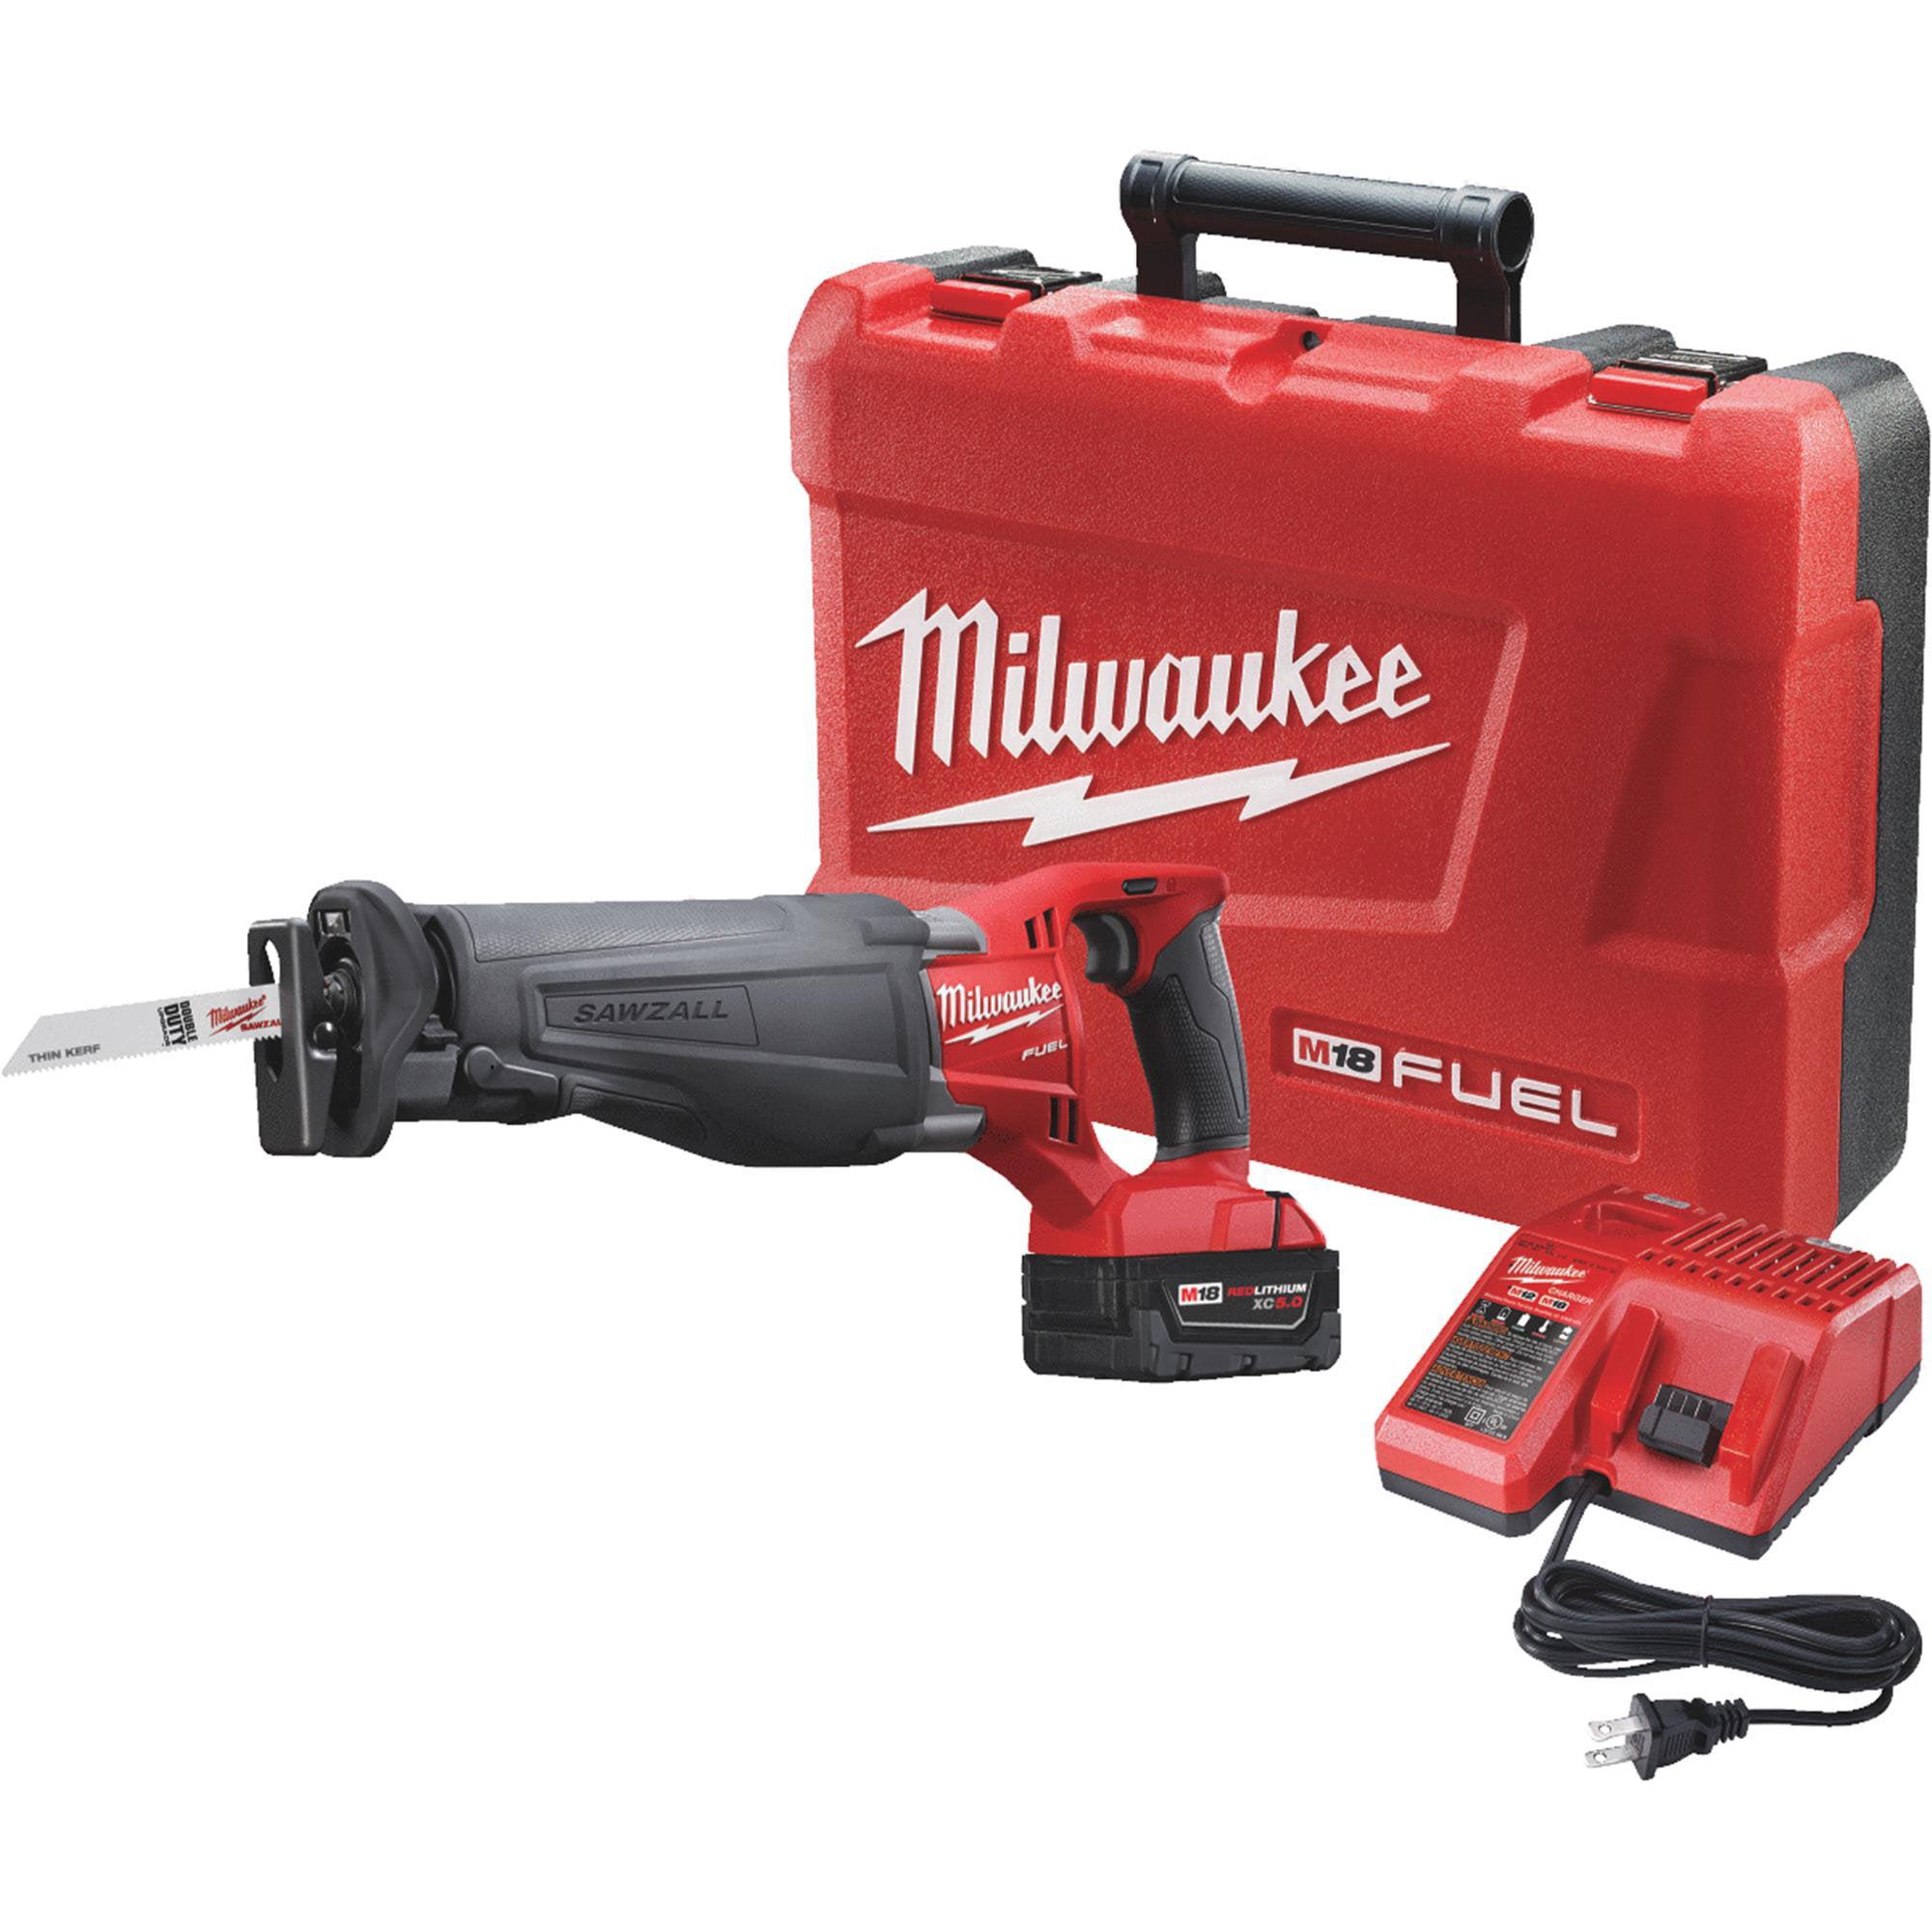 M18 Fuel Sawzall Reciprocating Saw Kit by Milwaukee